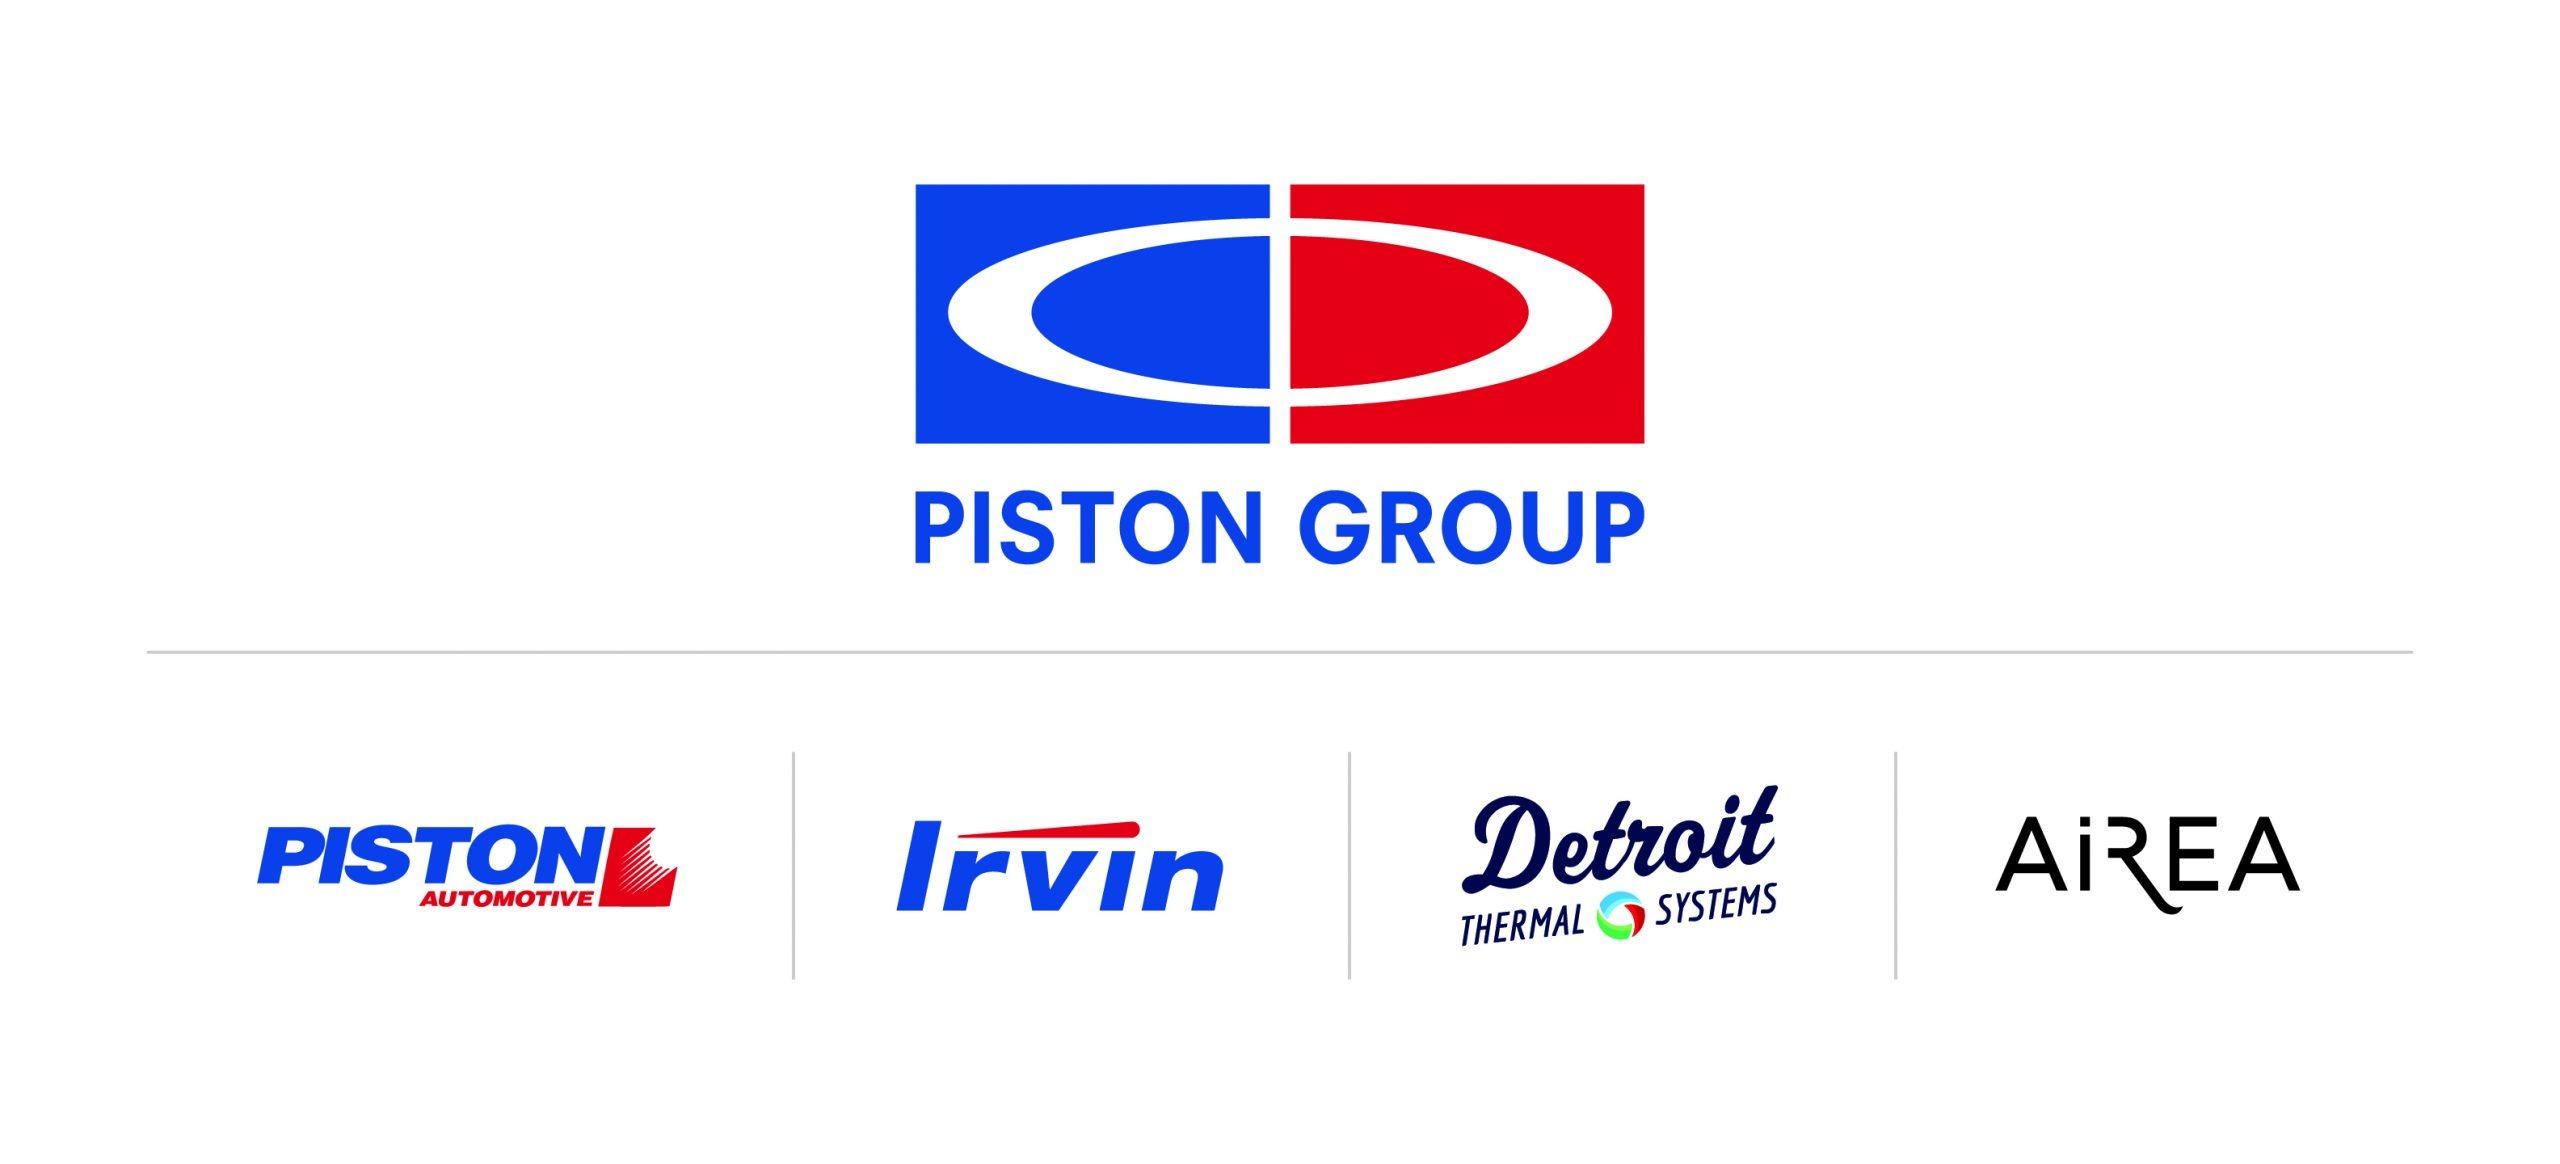 Piston Group